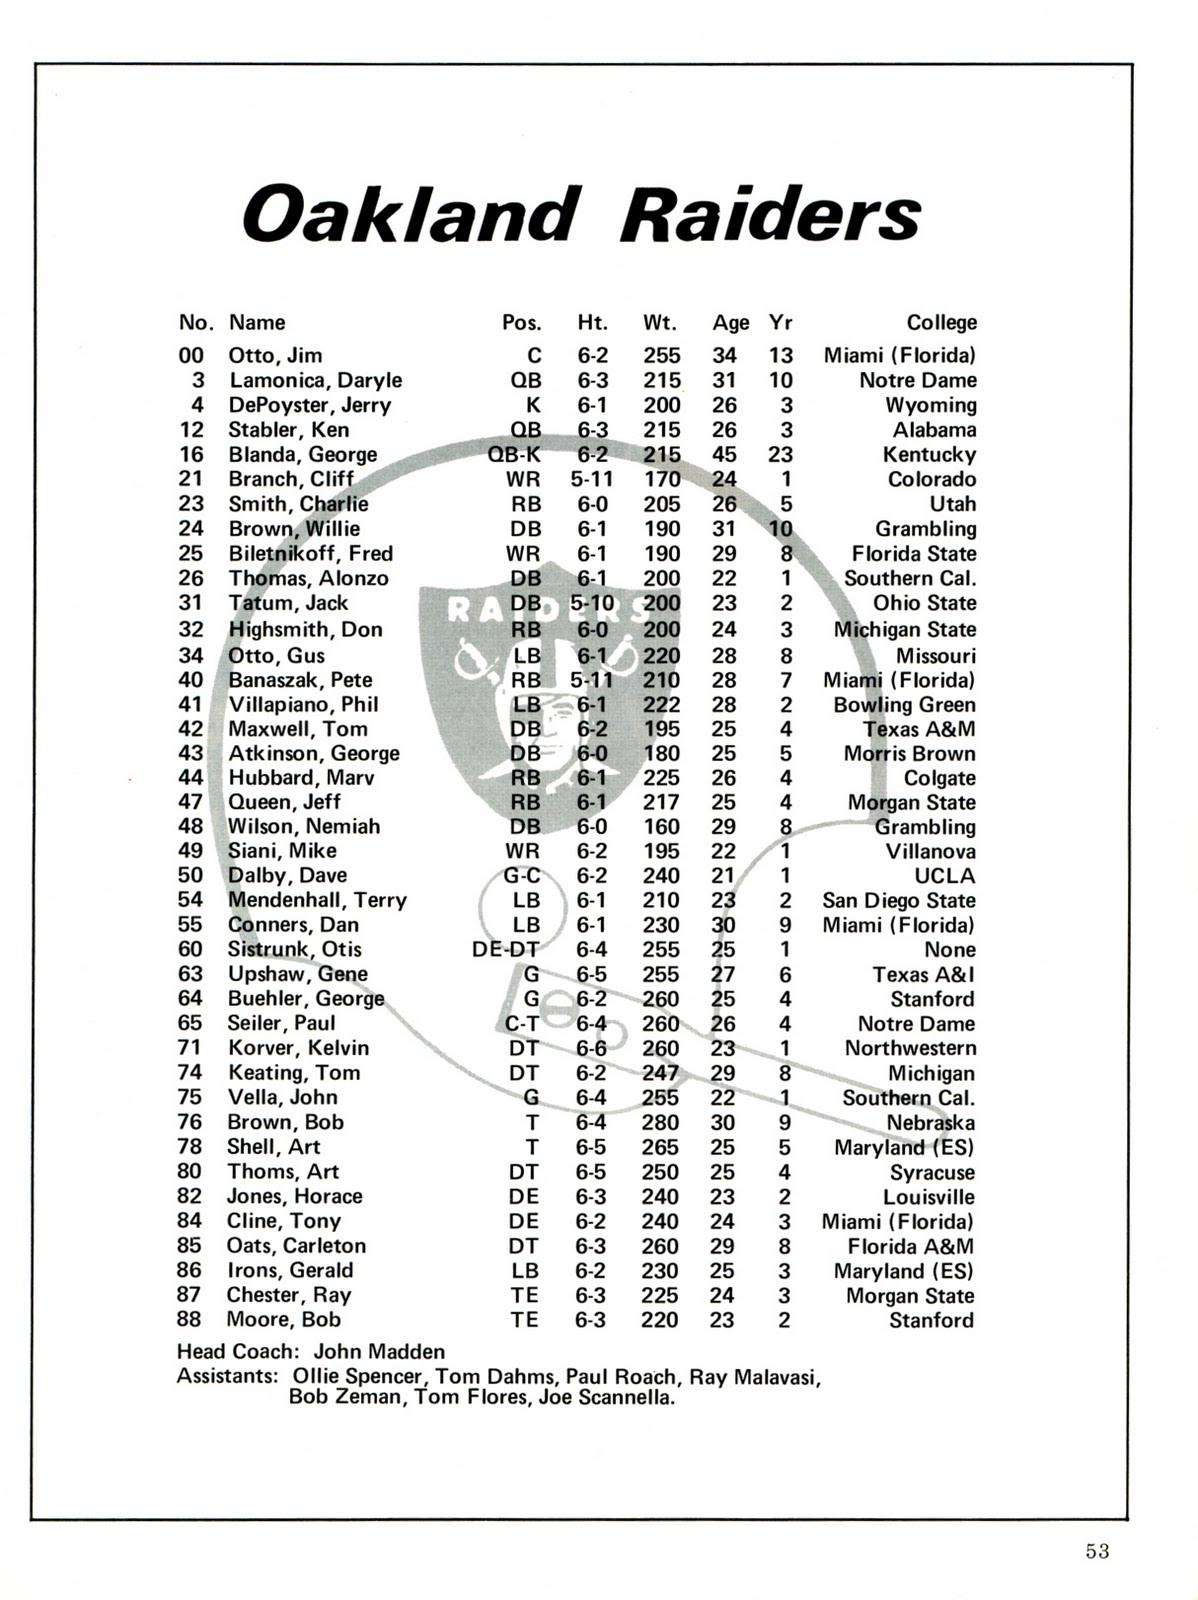 Green Bay Packers Roster >> PACKERVILLE, U.S.A.: September 1972 Program II